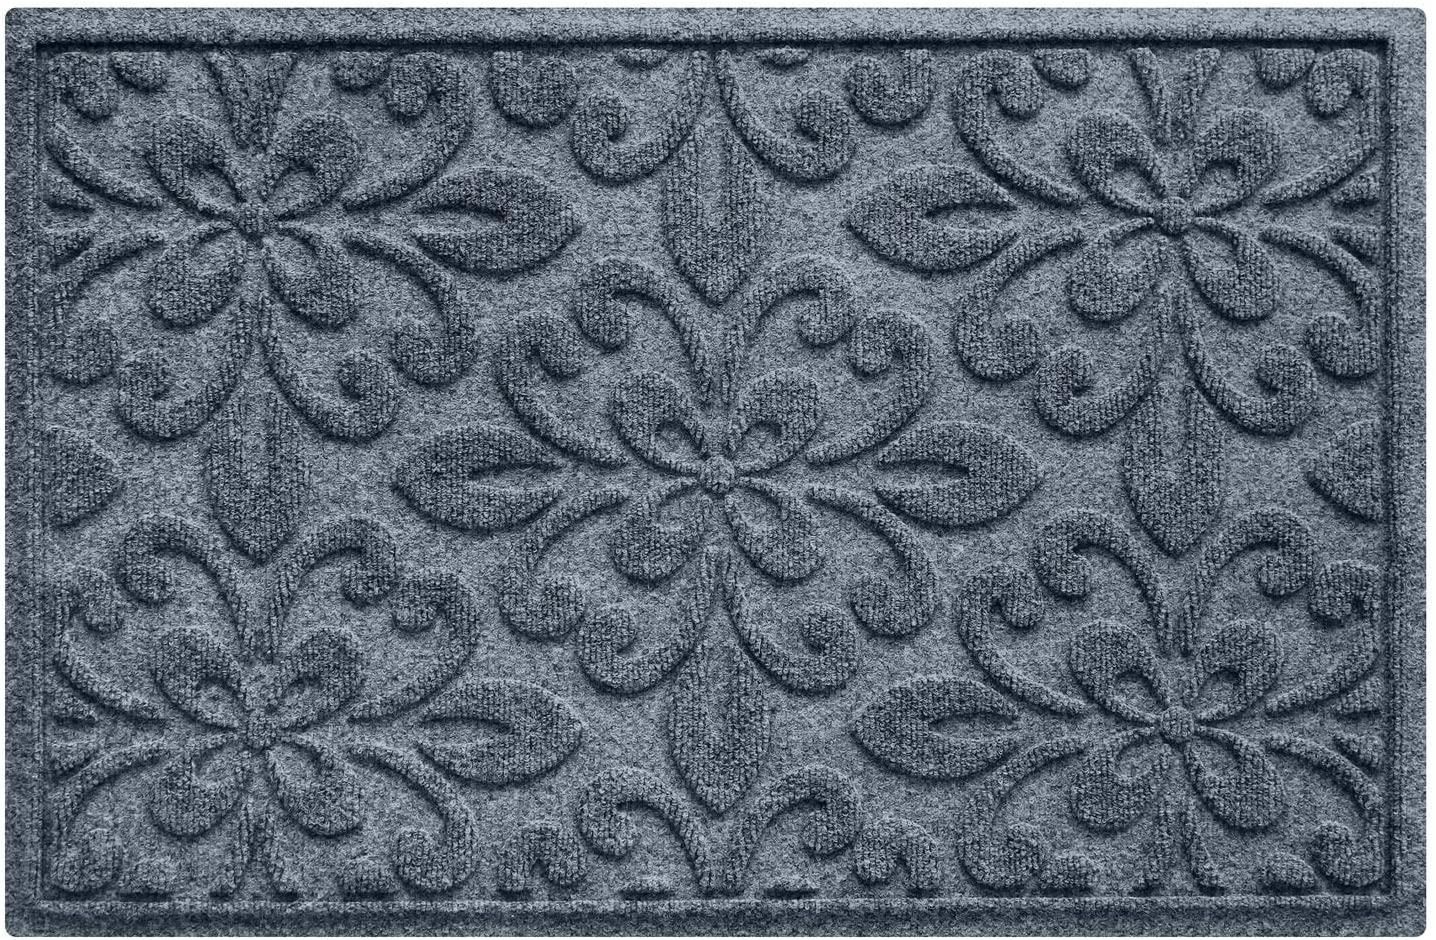 Bungalow Flooring Waterhog Door Mat, 2' x 3' Made in USA, Durable and Decorative Floor Covering, Skid Resistant, Indoor/Outdoor, Water-Trapping, Phoenix Collection, Bluestone